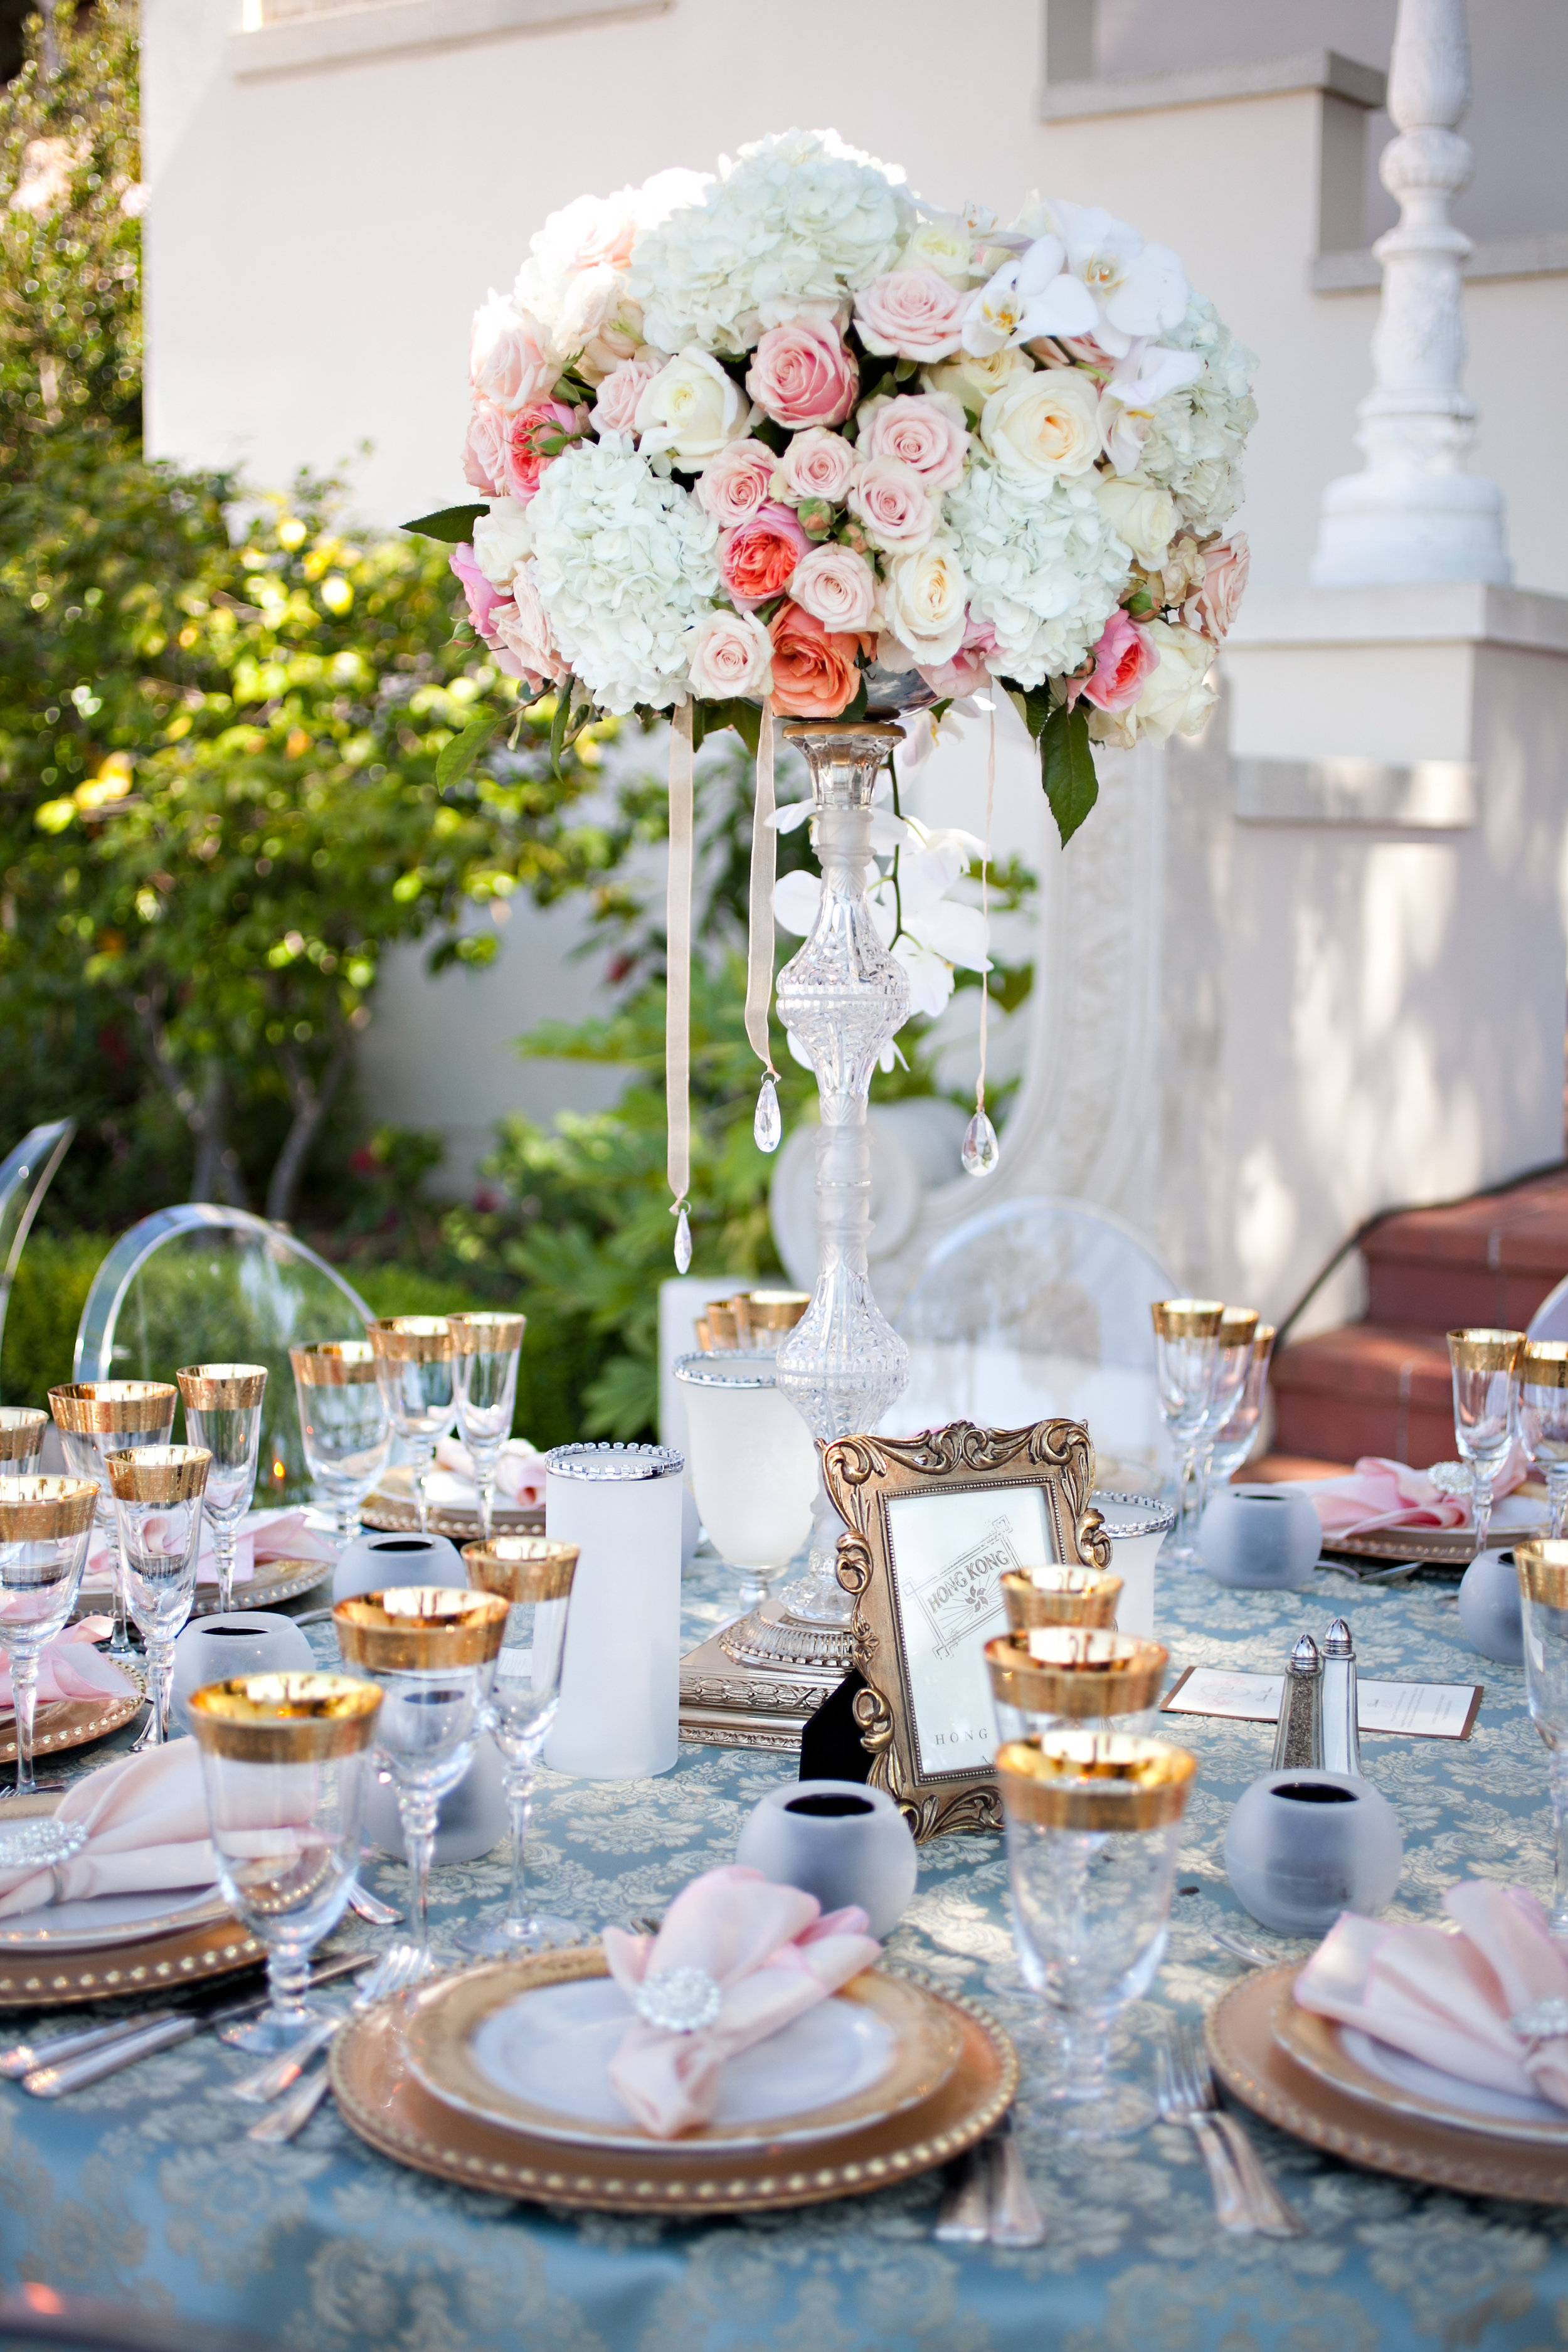 9085_linda_vu_wedding-1616976963-O.jpg